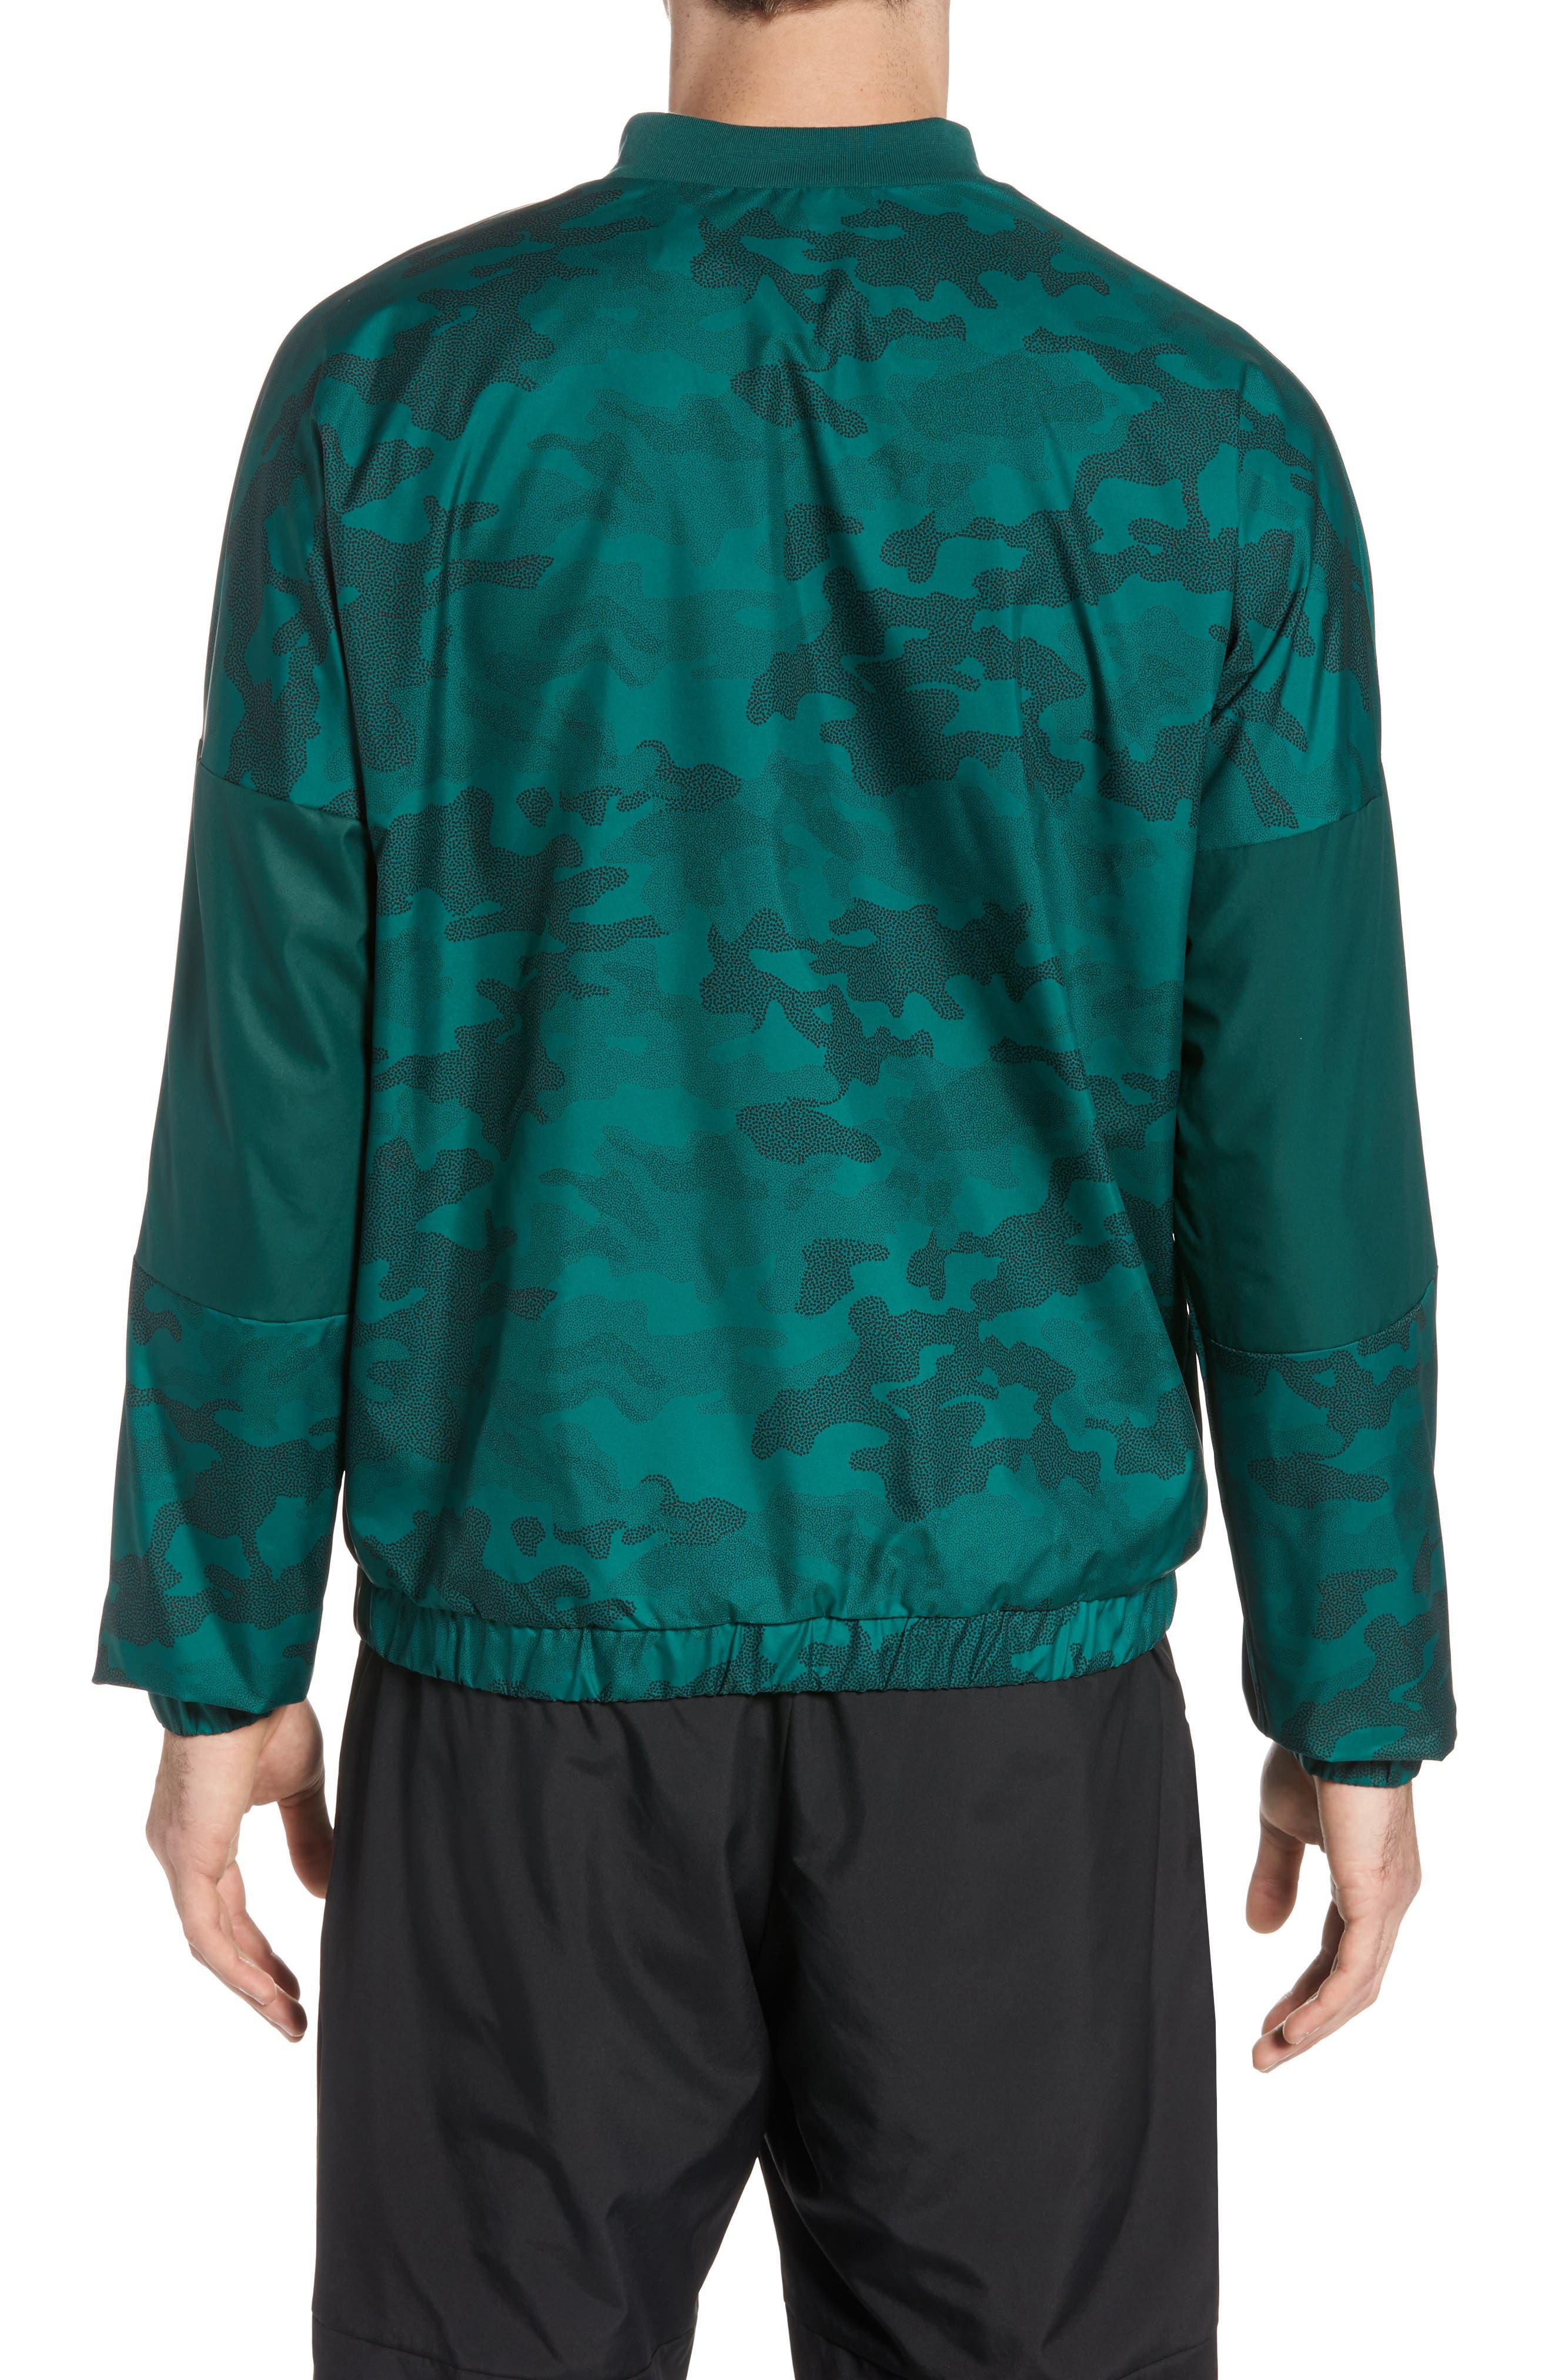 Regular Fit Track Jacket,                             Alternate thumbnail 2, color,                             Collegiate Green/ Black